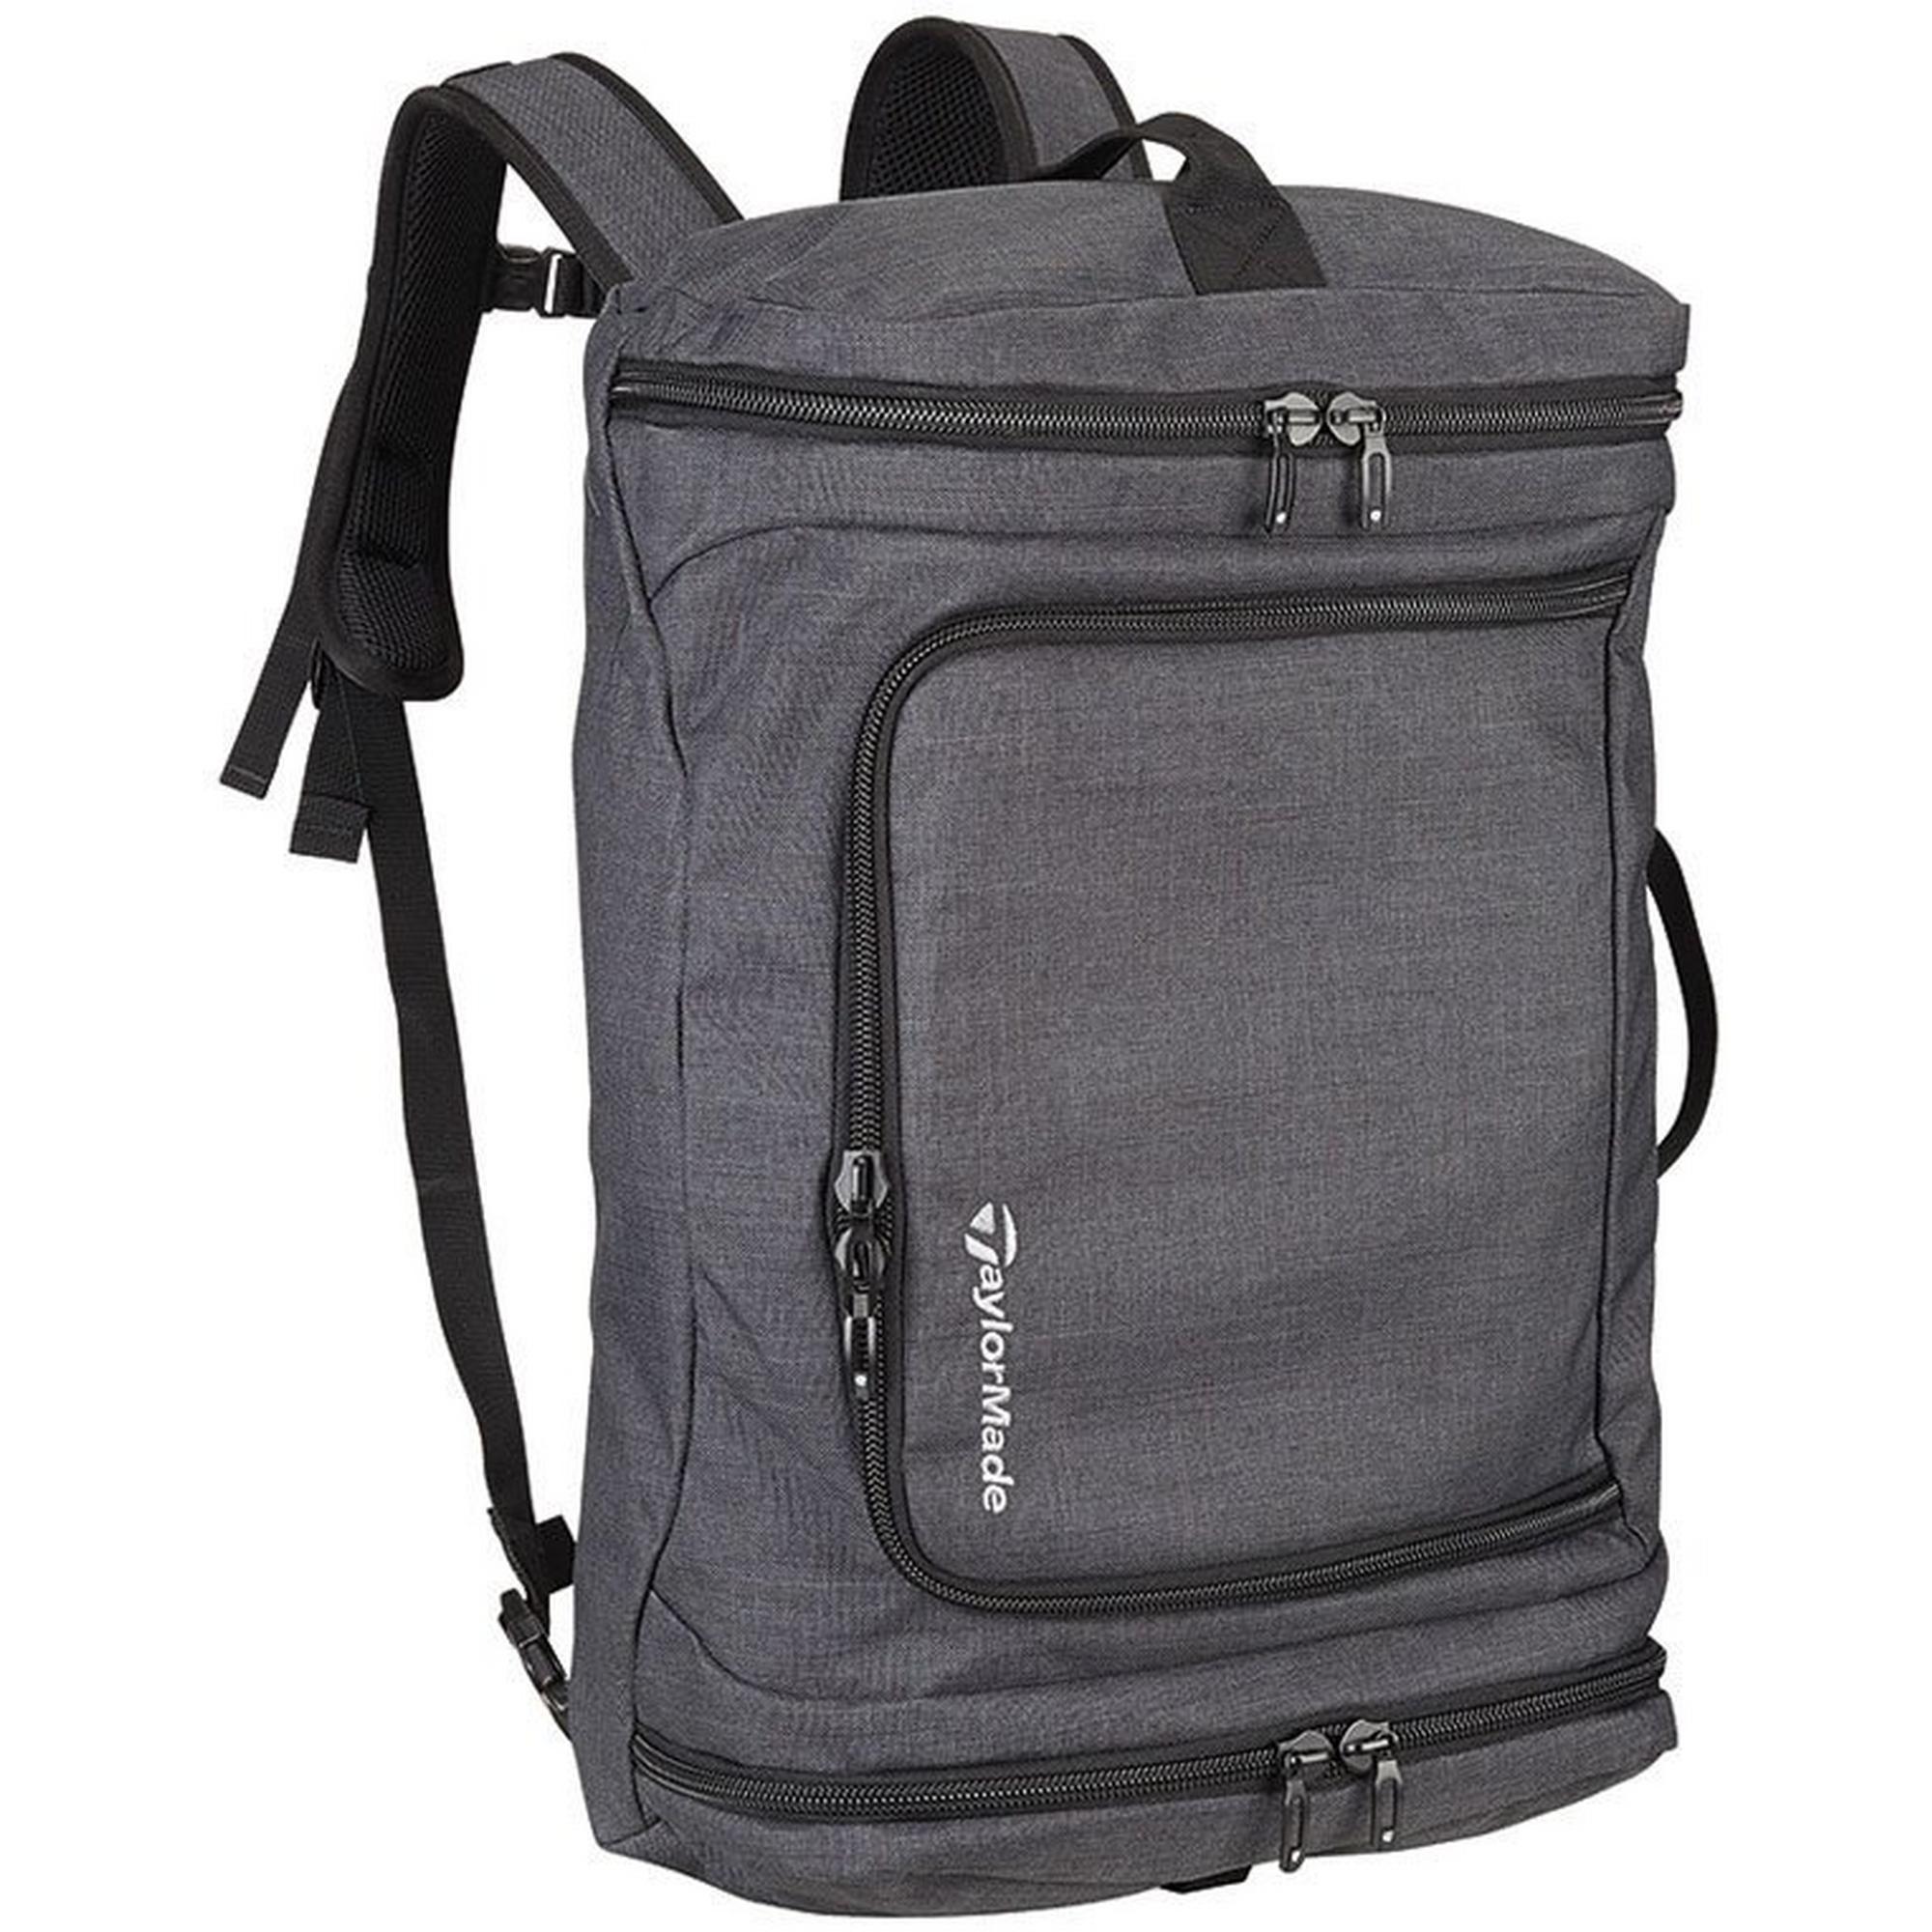 Players Duffel Backpack